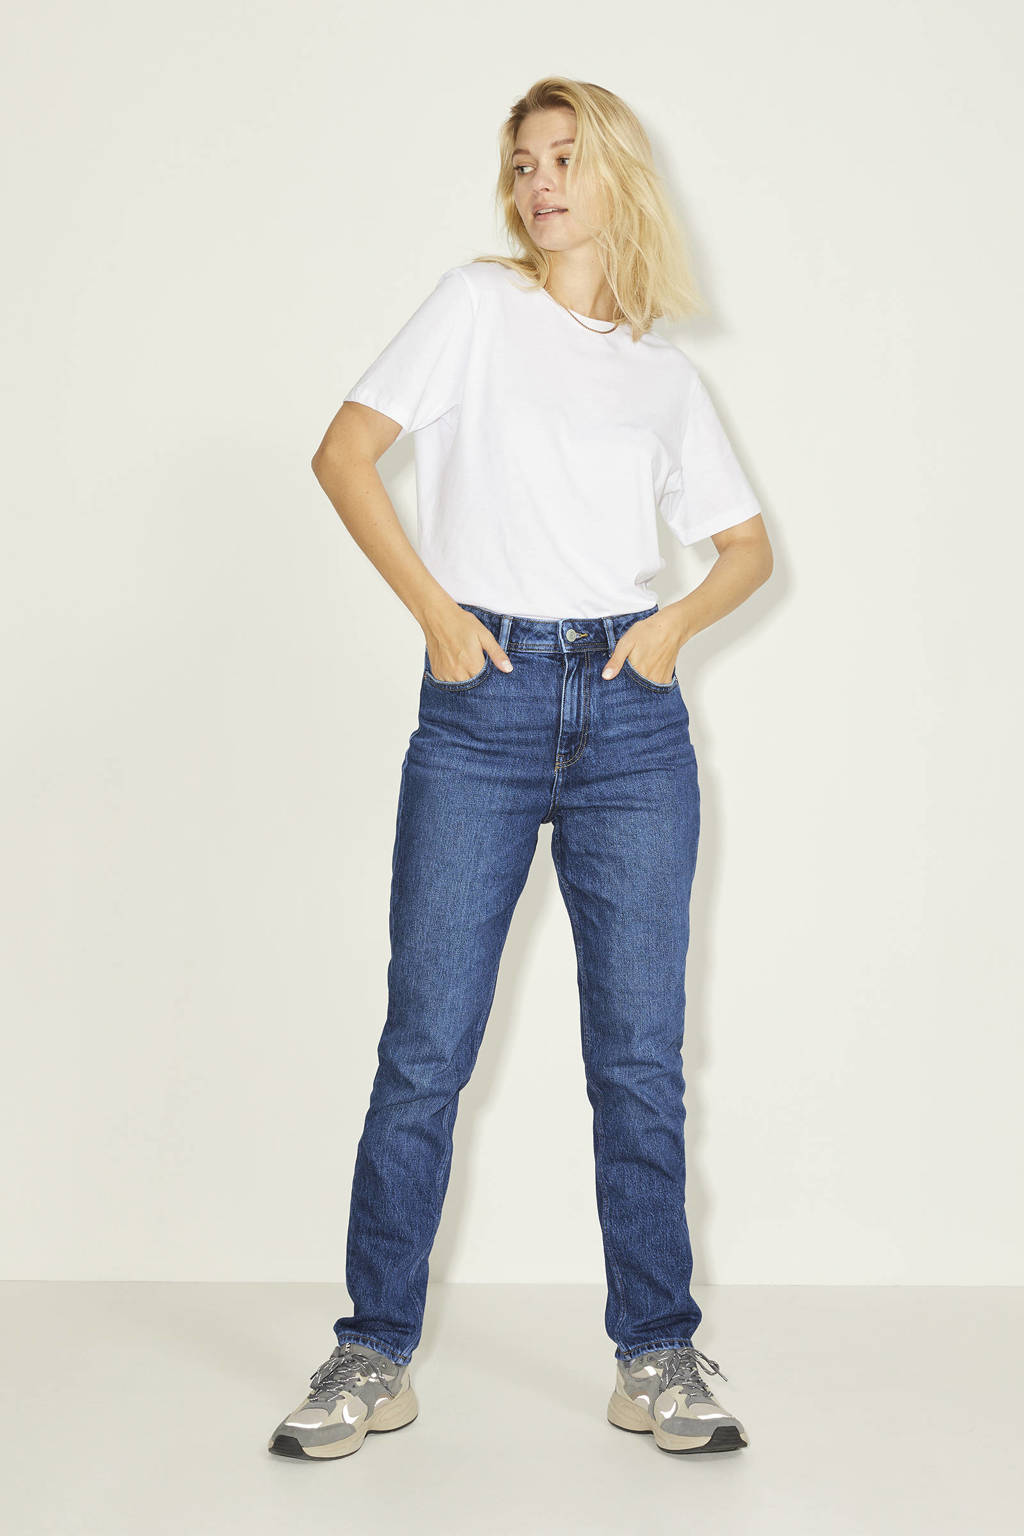 JJXX high waist slim fit jeans JXBERLIN dark blue, Dark Blue